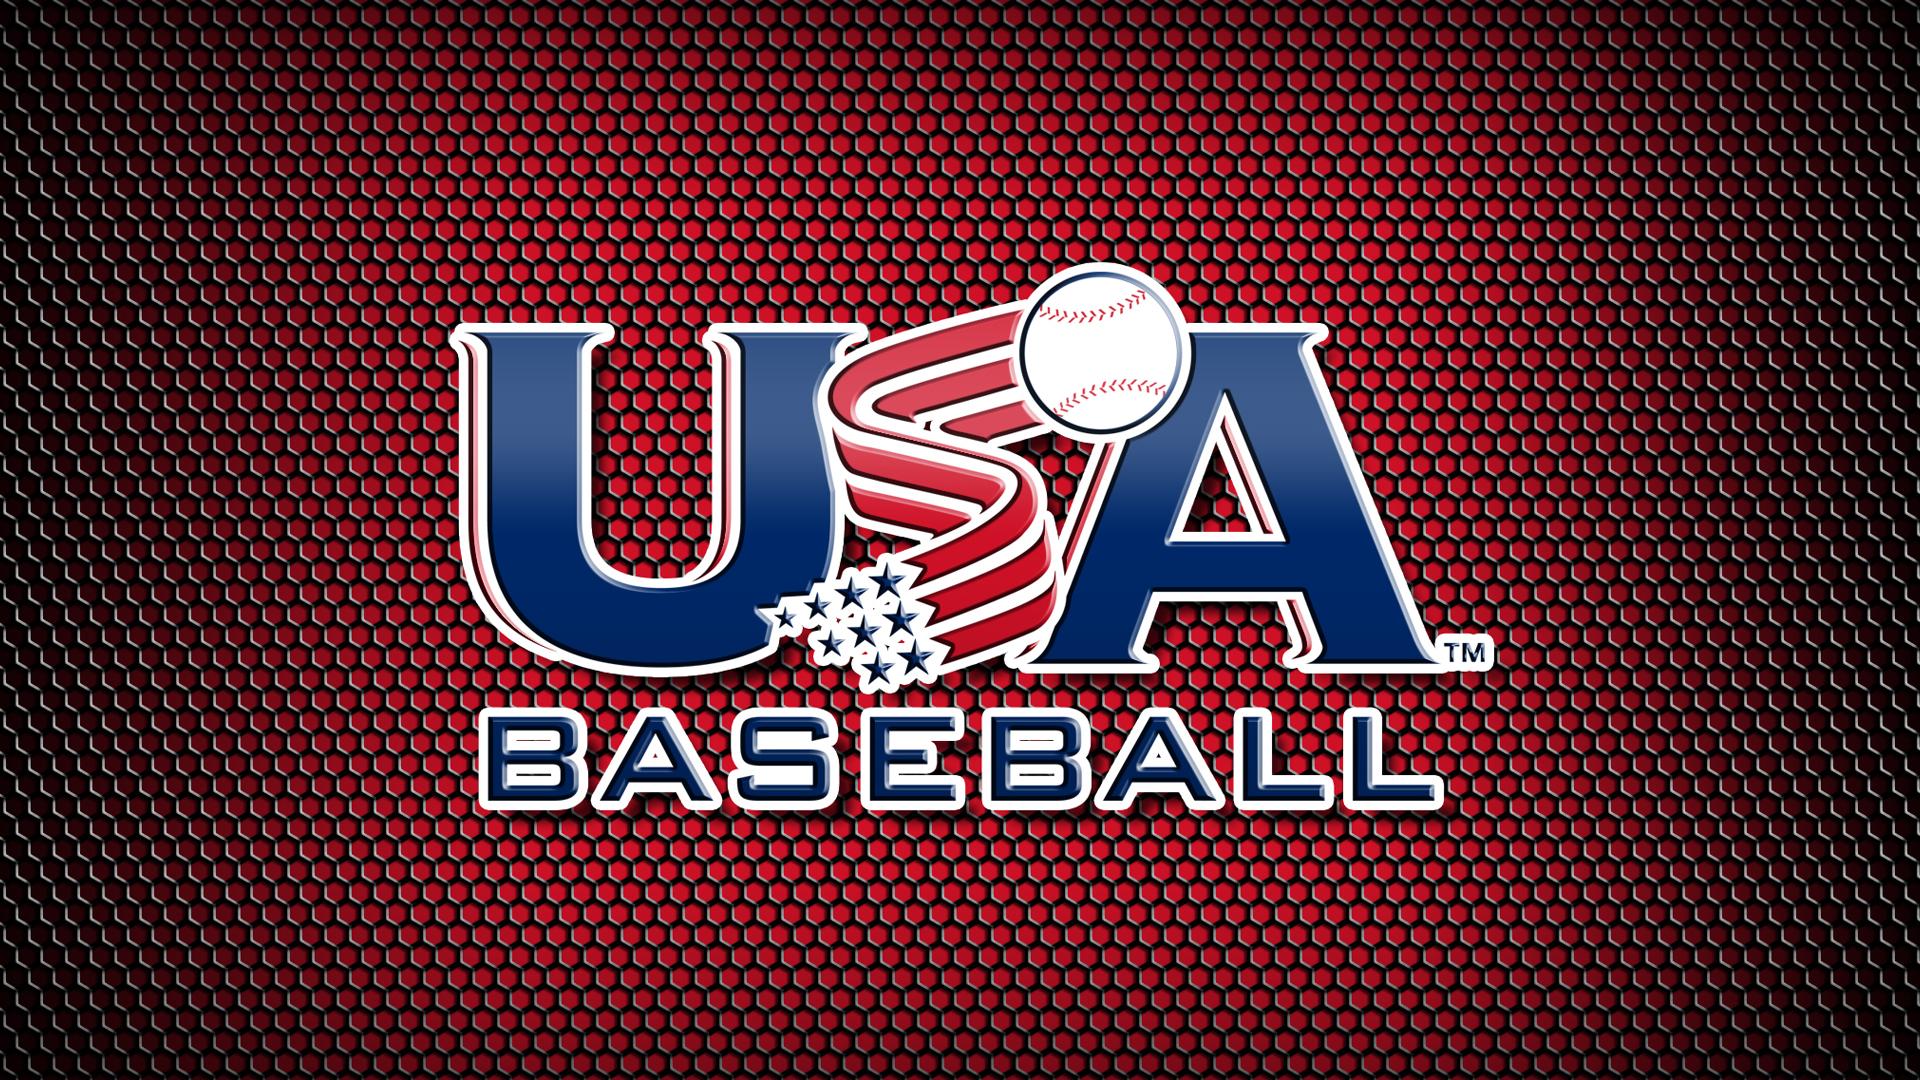 Usa Baseball wallpaper   908188 1920x1080